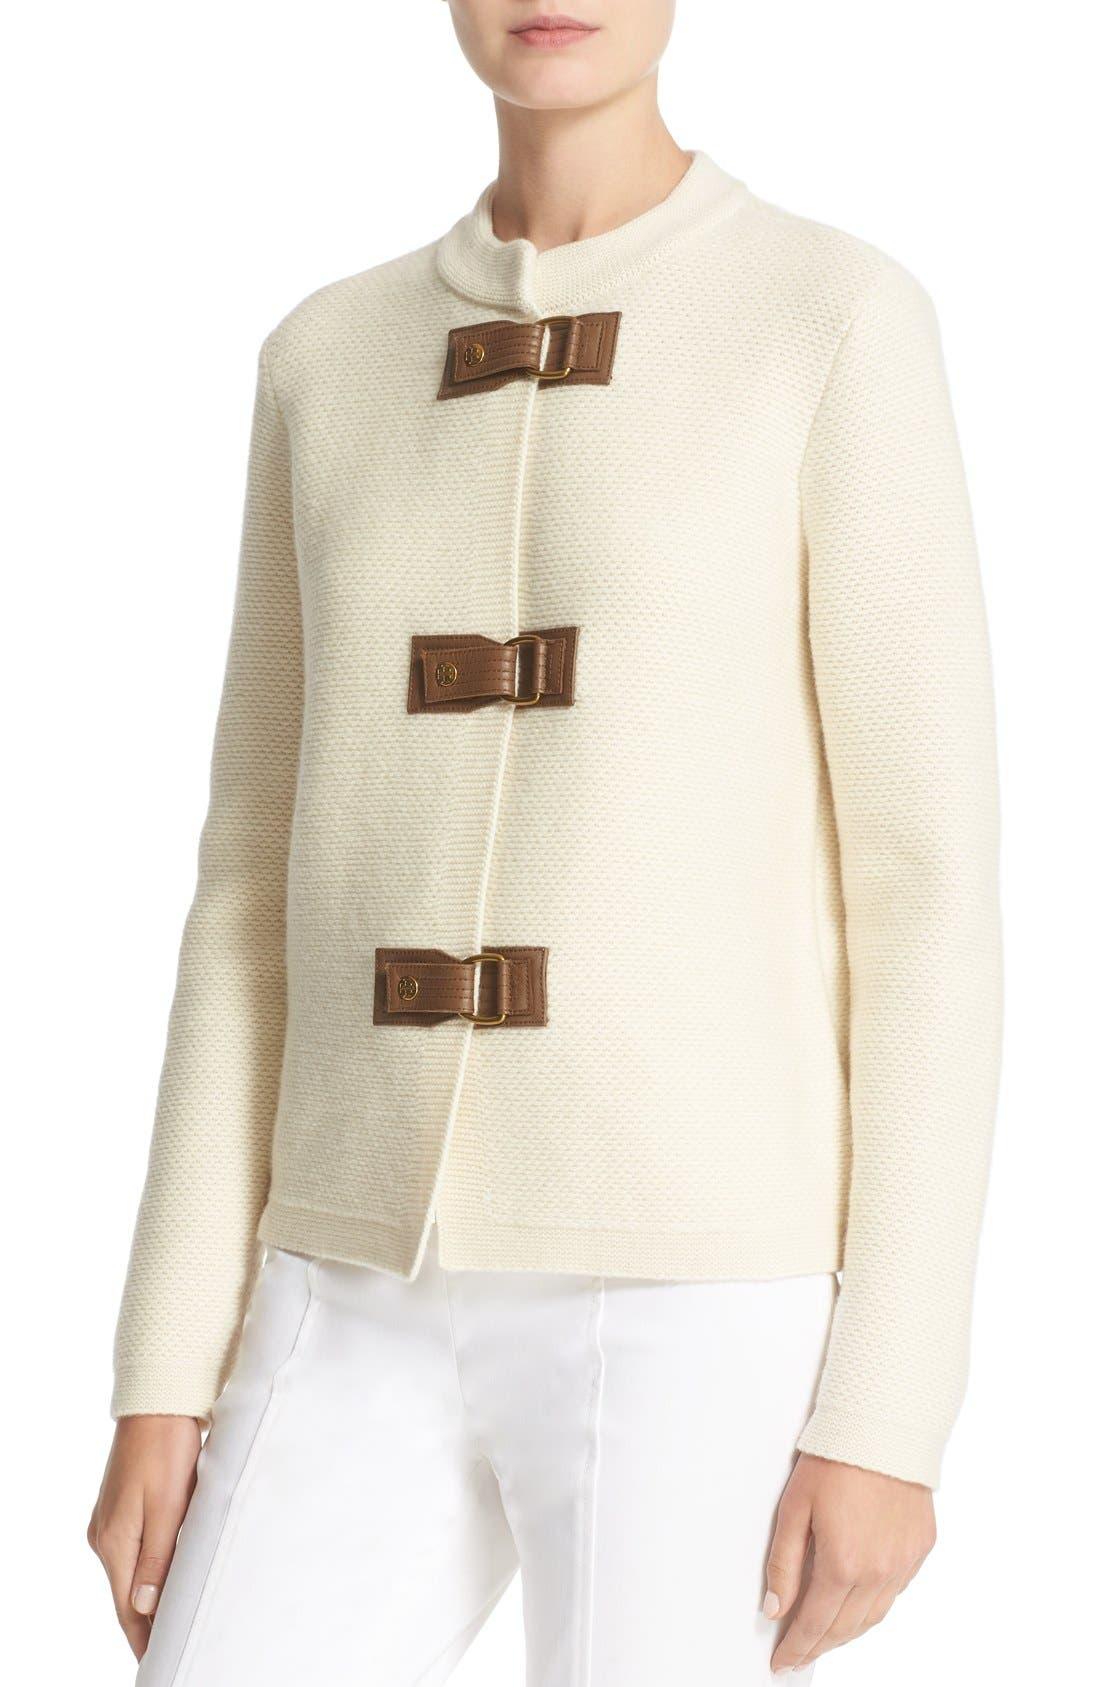 Alternate Image 4  - Tory Burch 'Ross' Leather Tab Merino Wool Cardigan